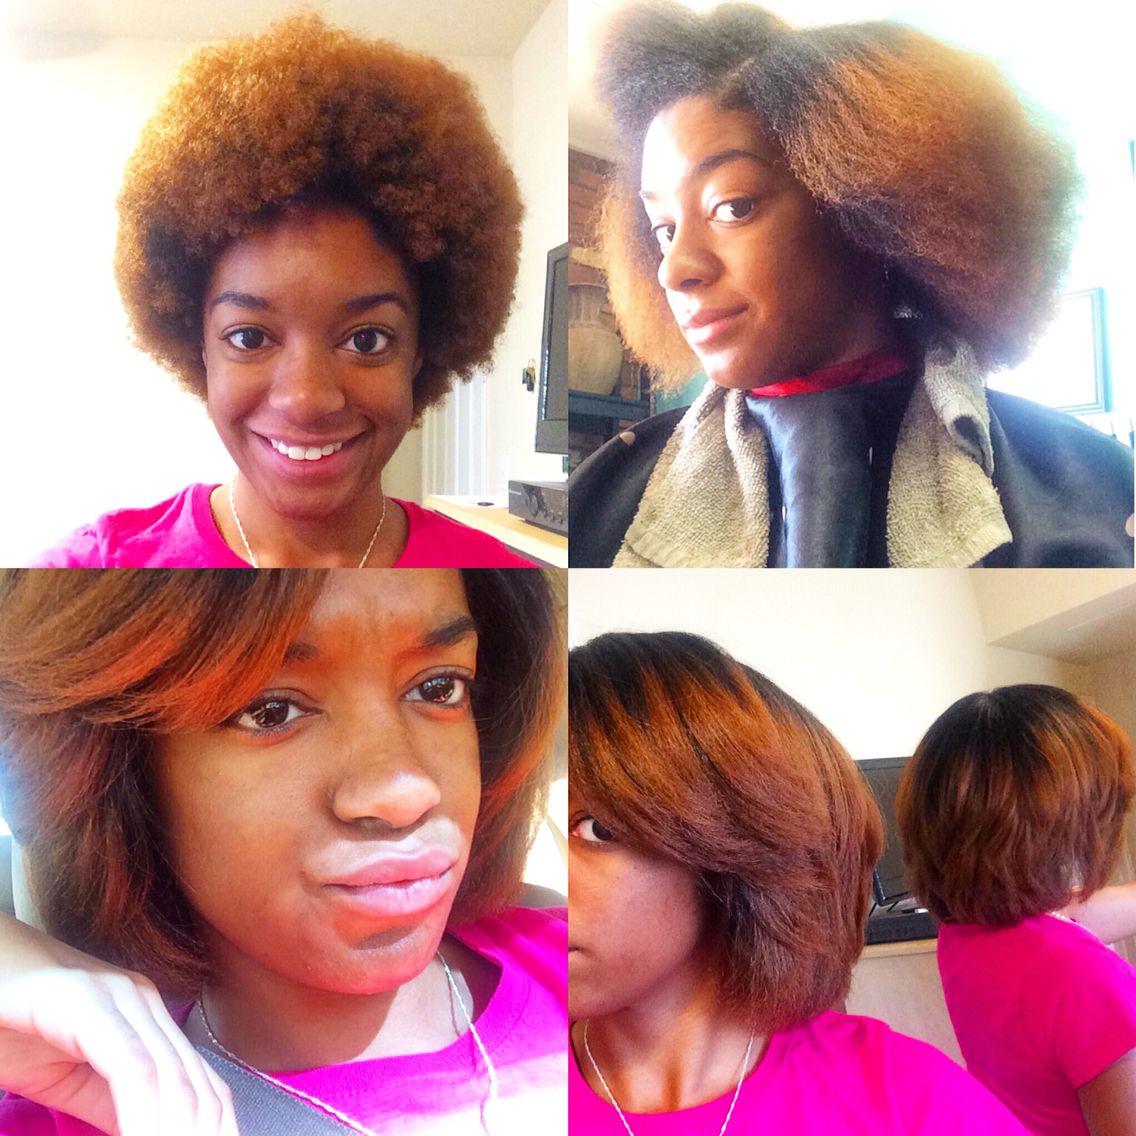 Natural Hair Colored Natural Hair 4c Hair 4b Hair Straight Natural Hair Hair Press Short Natural Hair Natural Hair Styles Short Hair Styles 4c Hairstyles